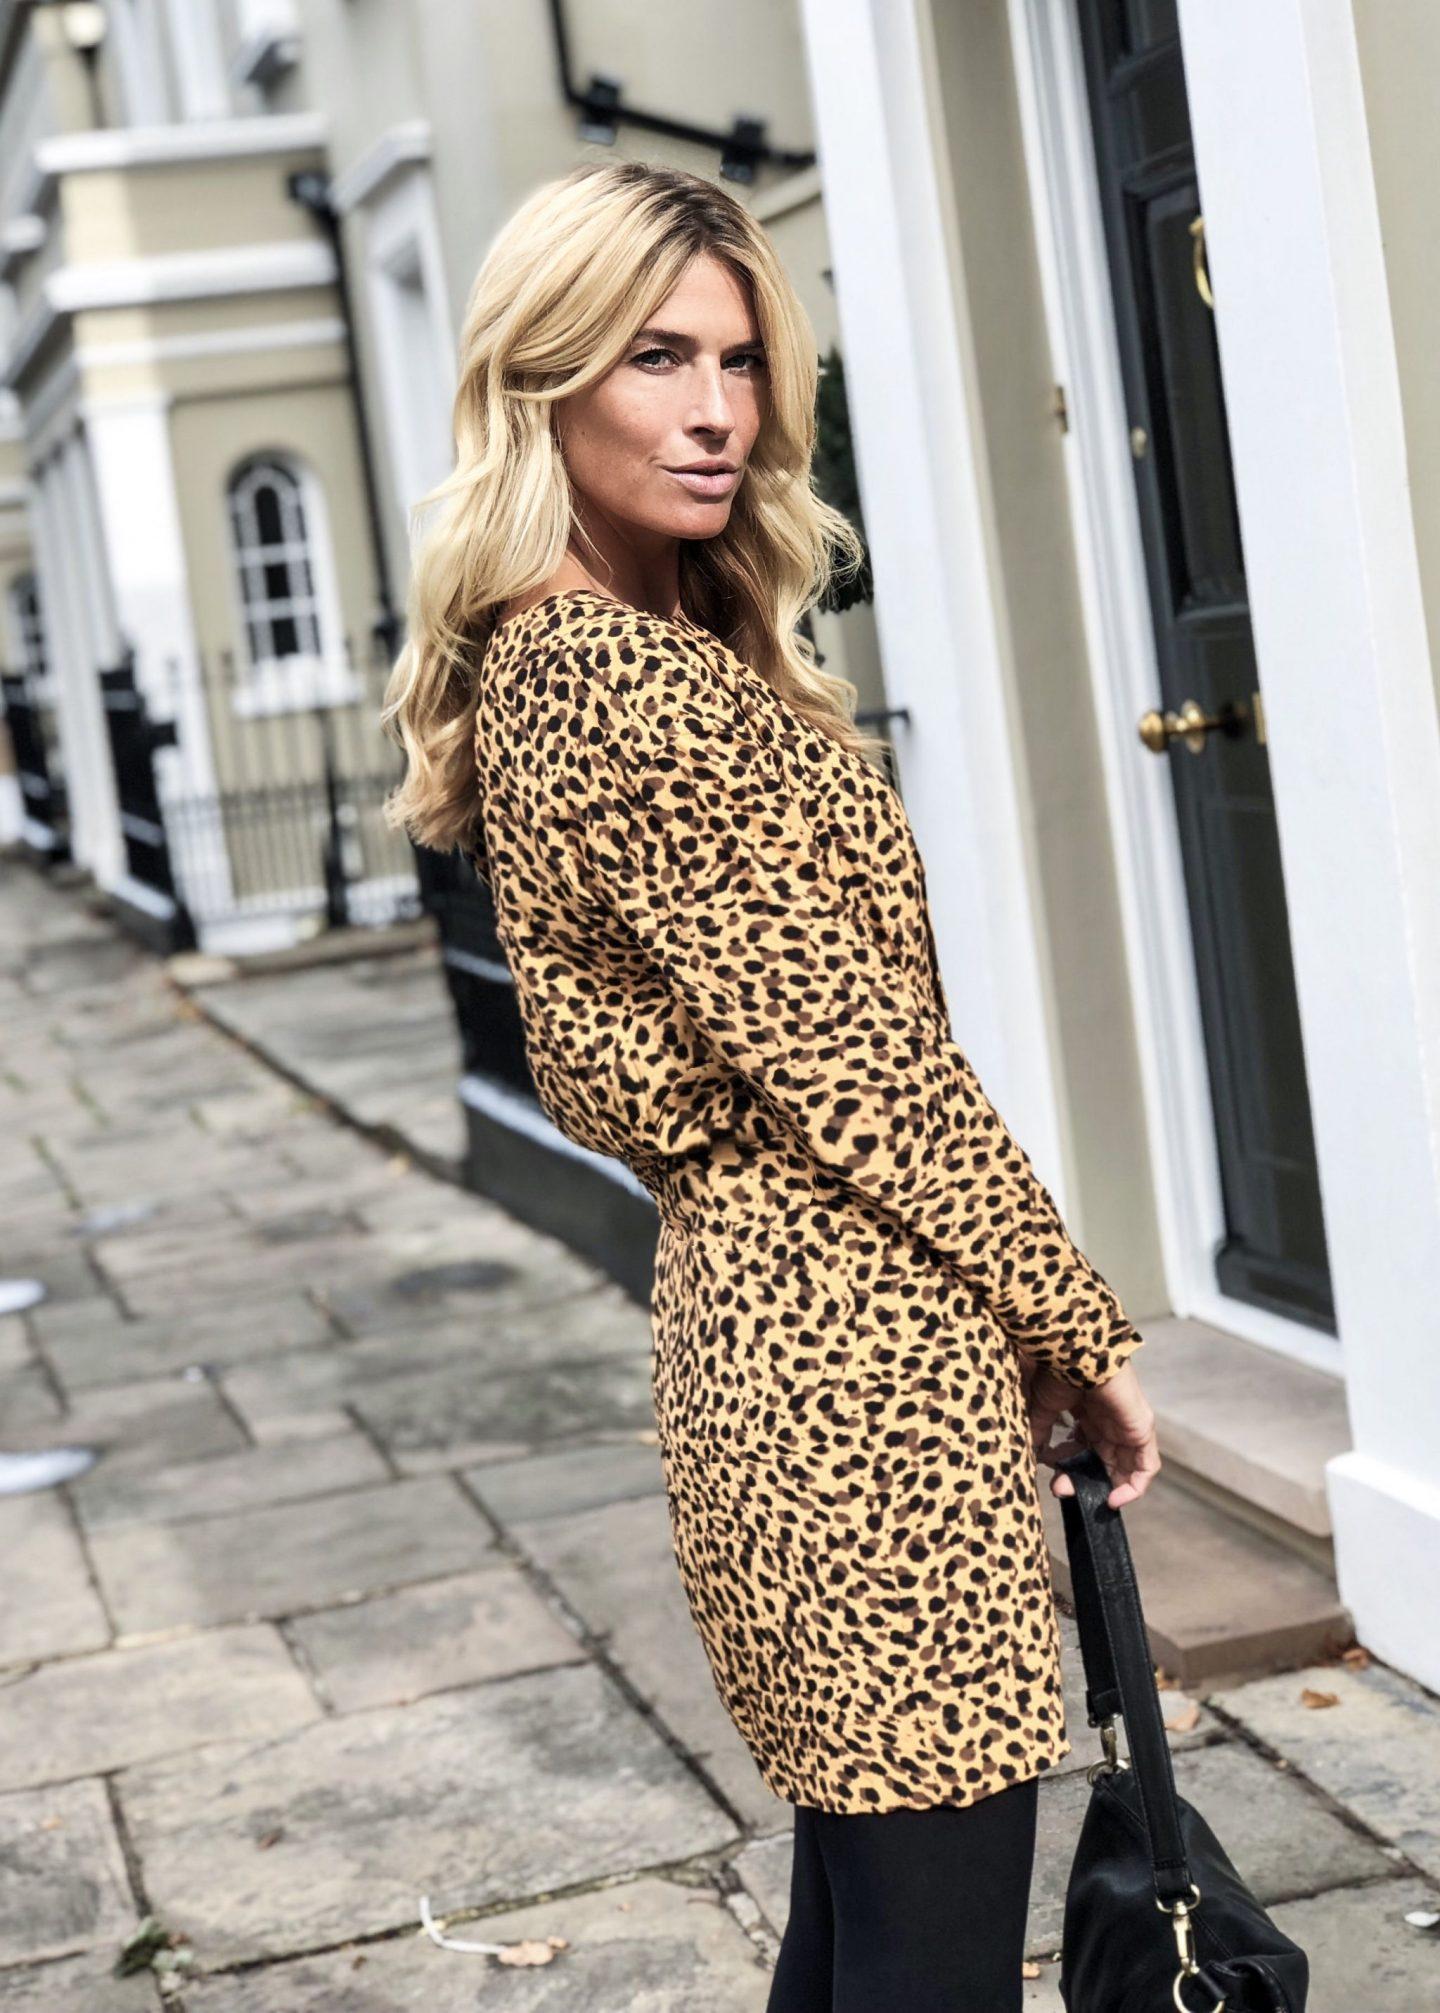 Fashion and style edit leopard print dress